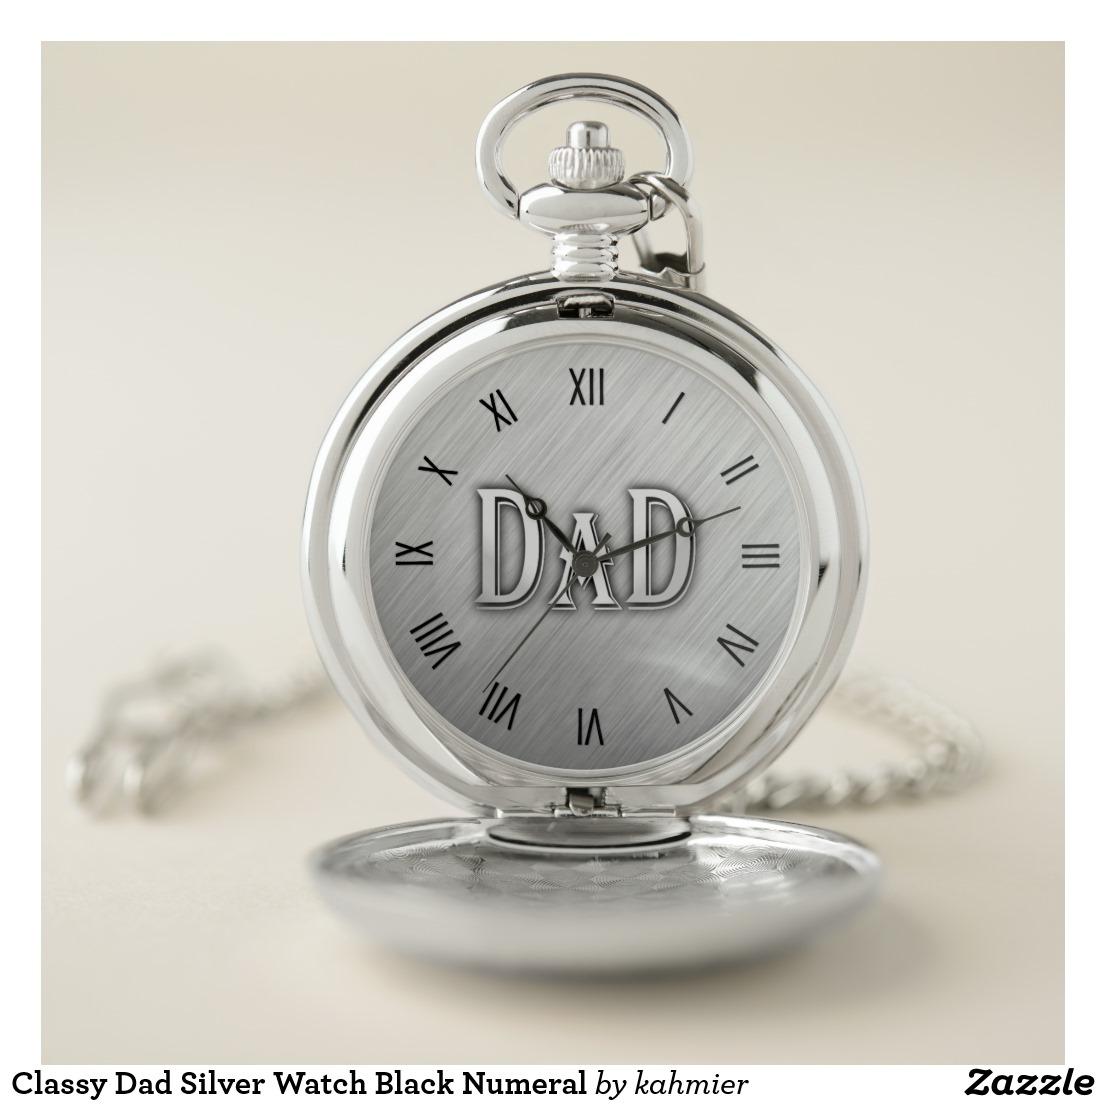 Classy Dad Silver Watch Black Numeral